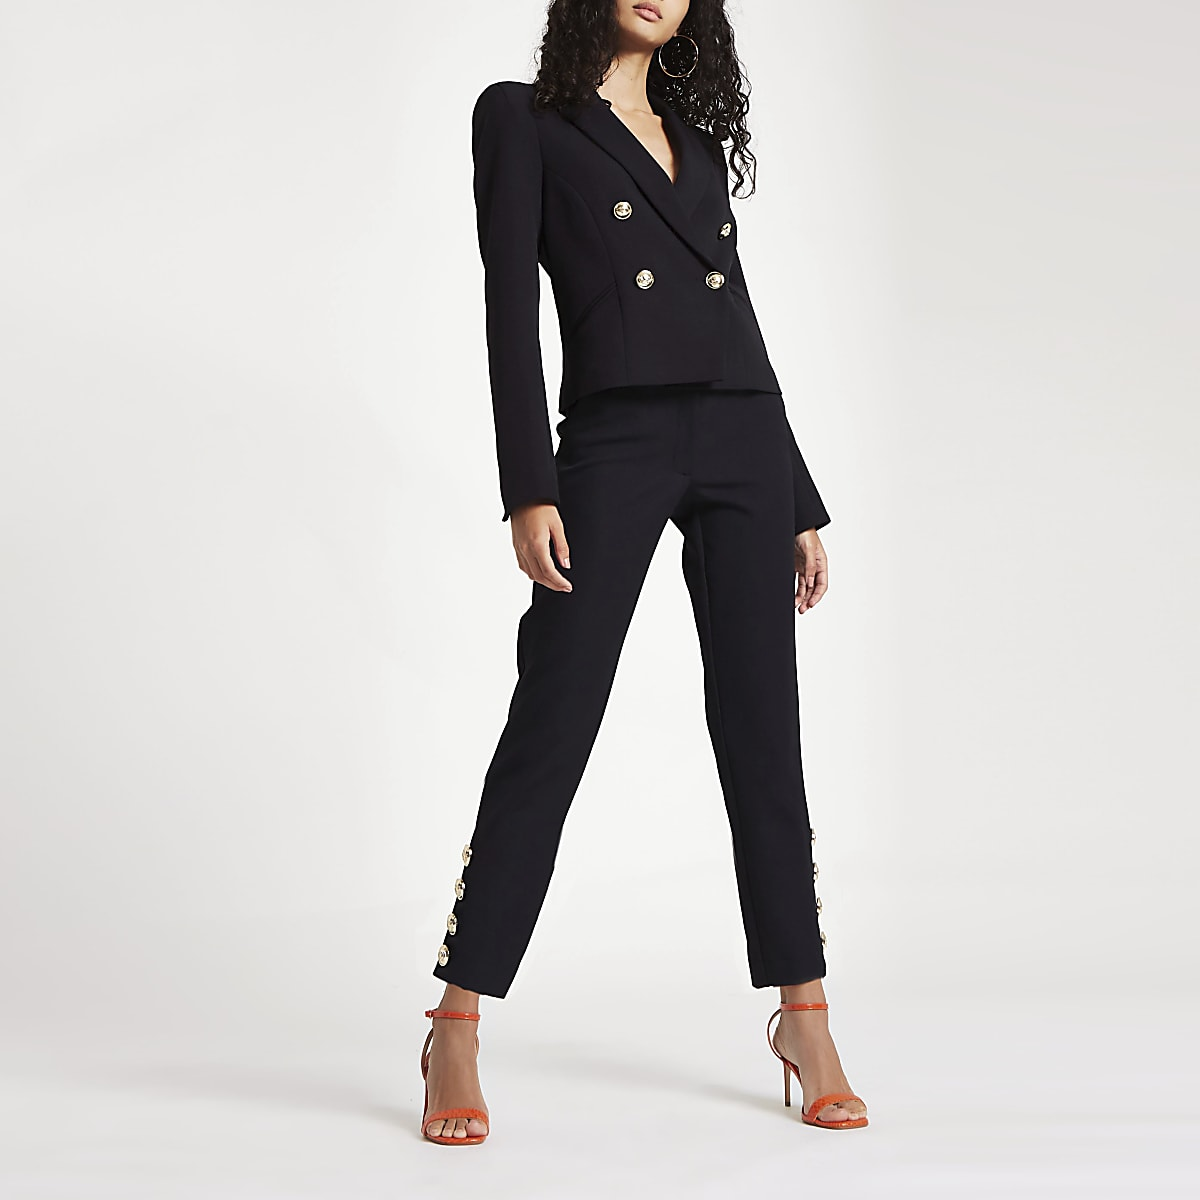 Black straight leg button trim trousers